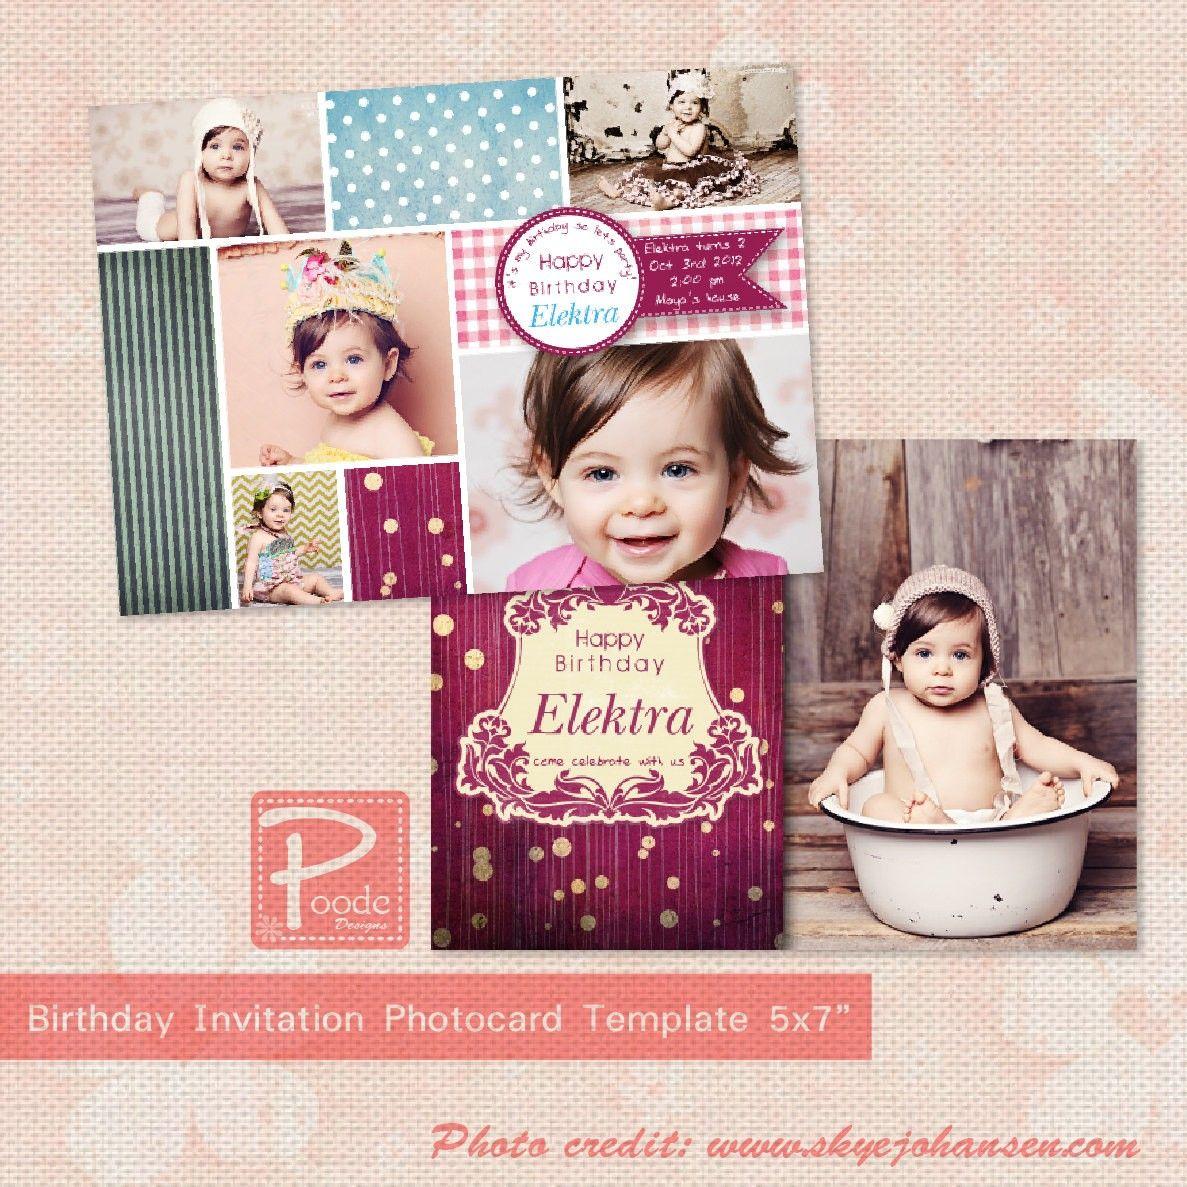 Invitation Templates Psd Free 1st Birthday Invitations Birthday Invitation Card Template Birthday Invitations Girl